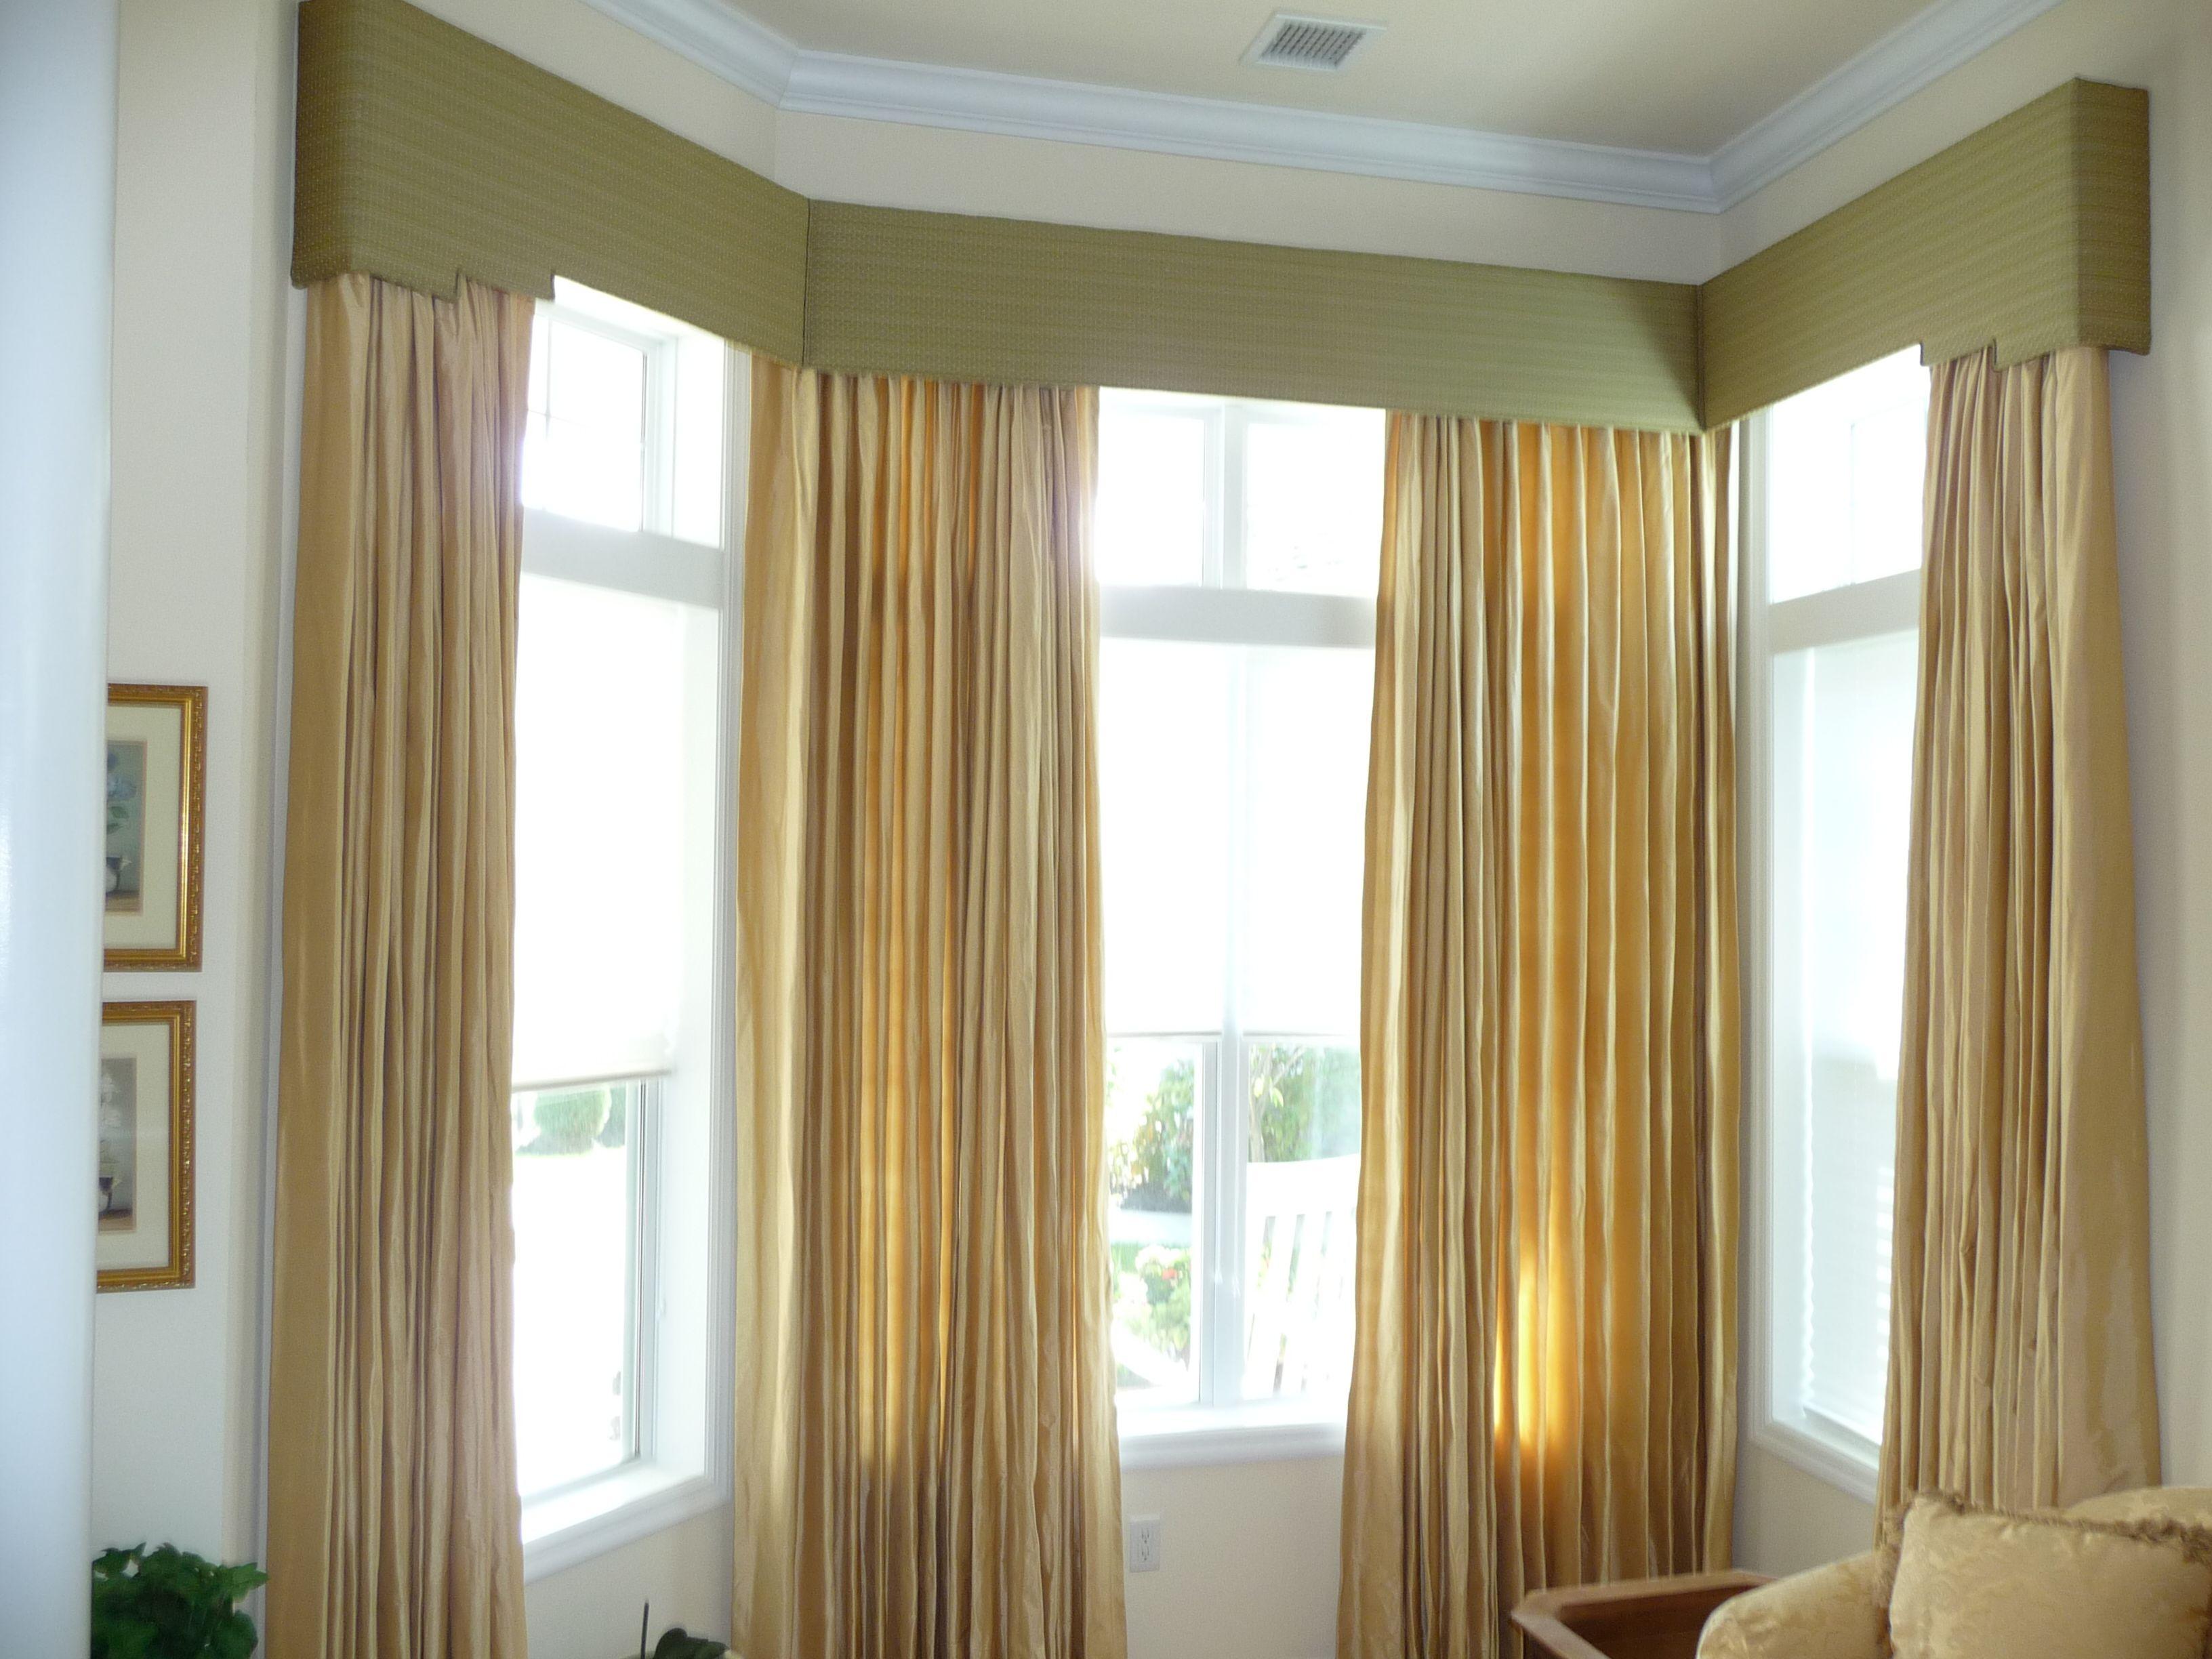 Drapes Window Treatments The Fabric Mill Curtains Curtains Window Treatments Window Treatments